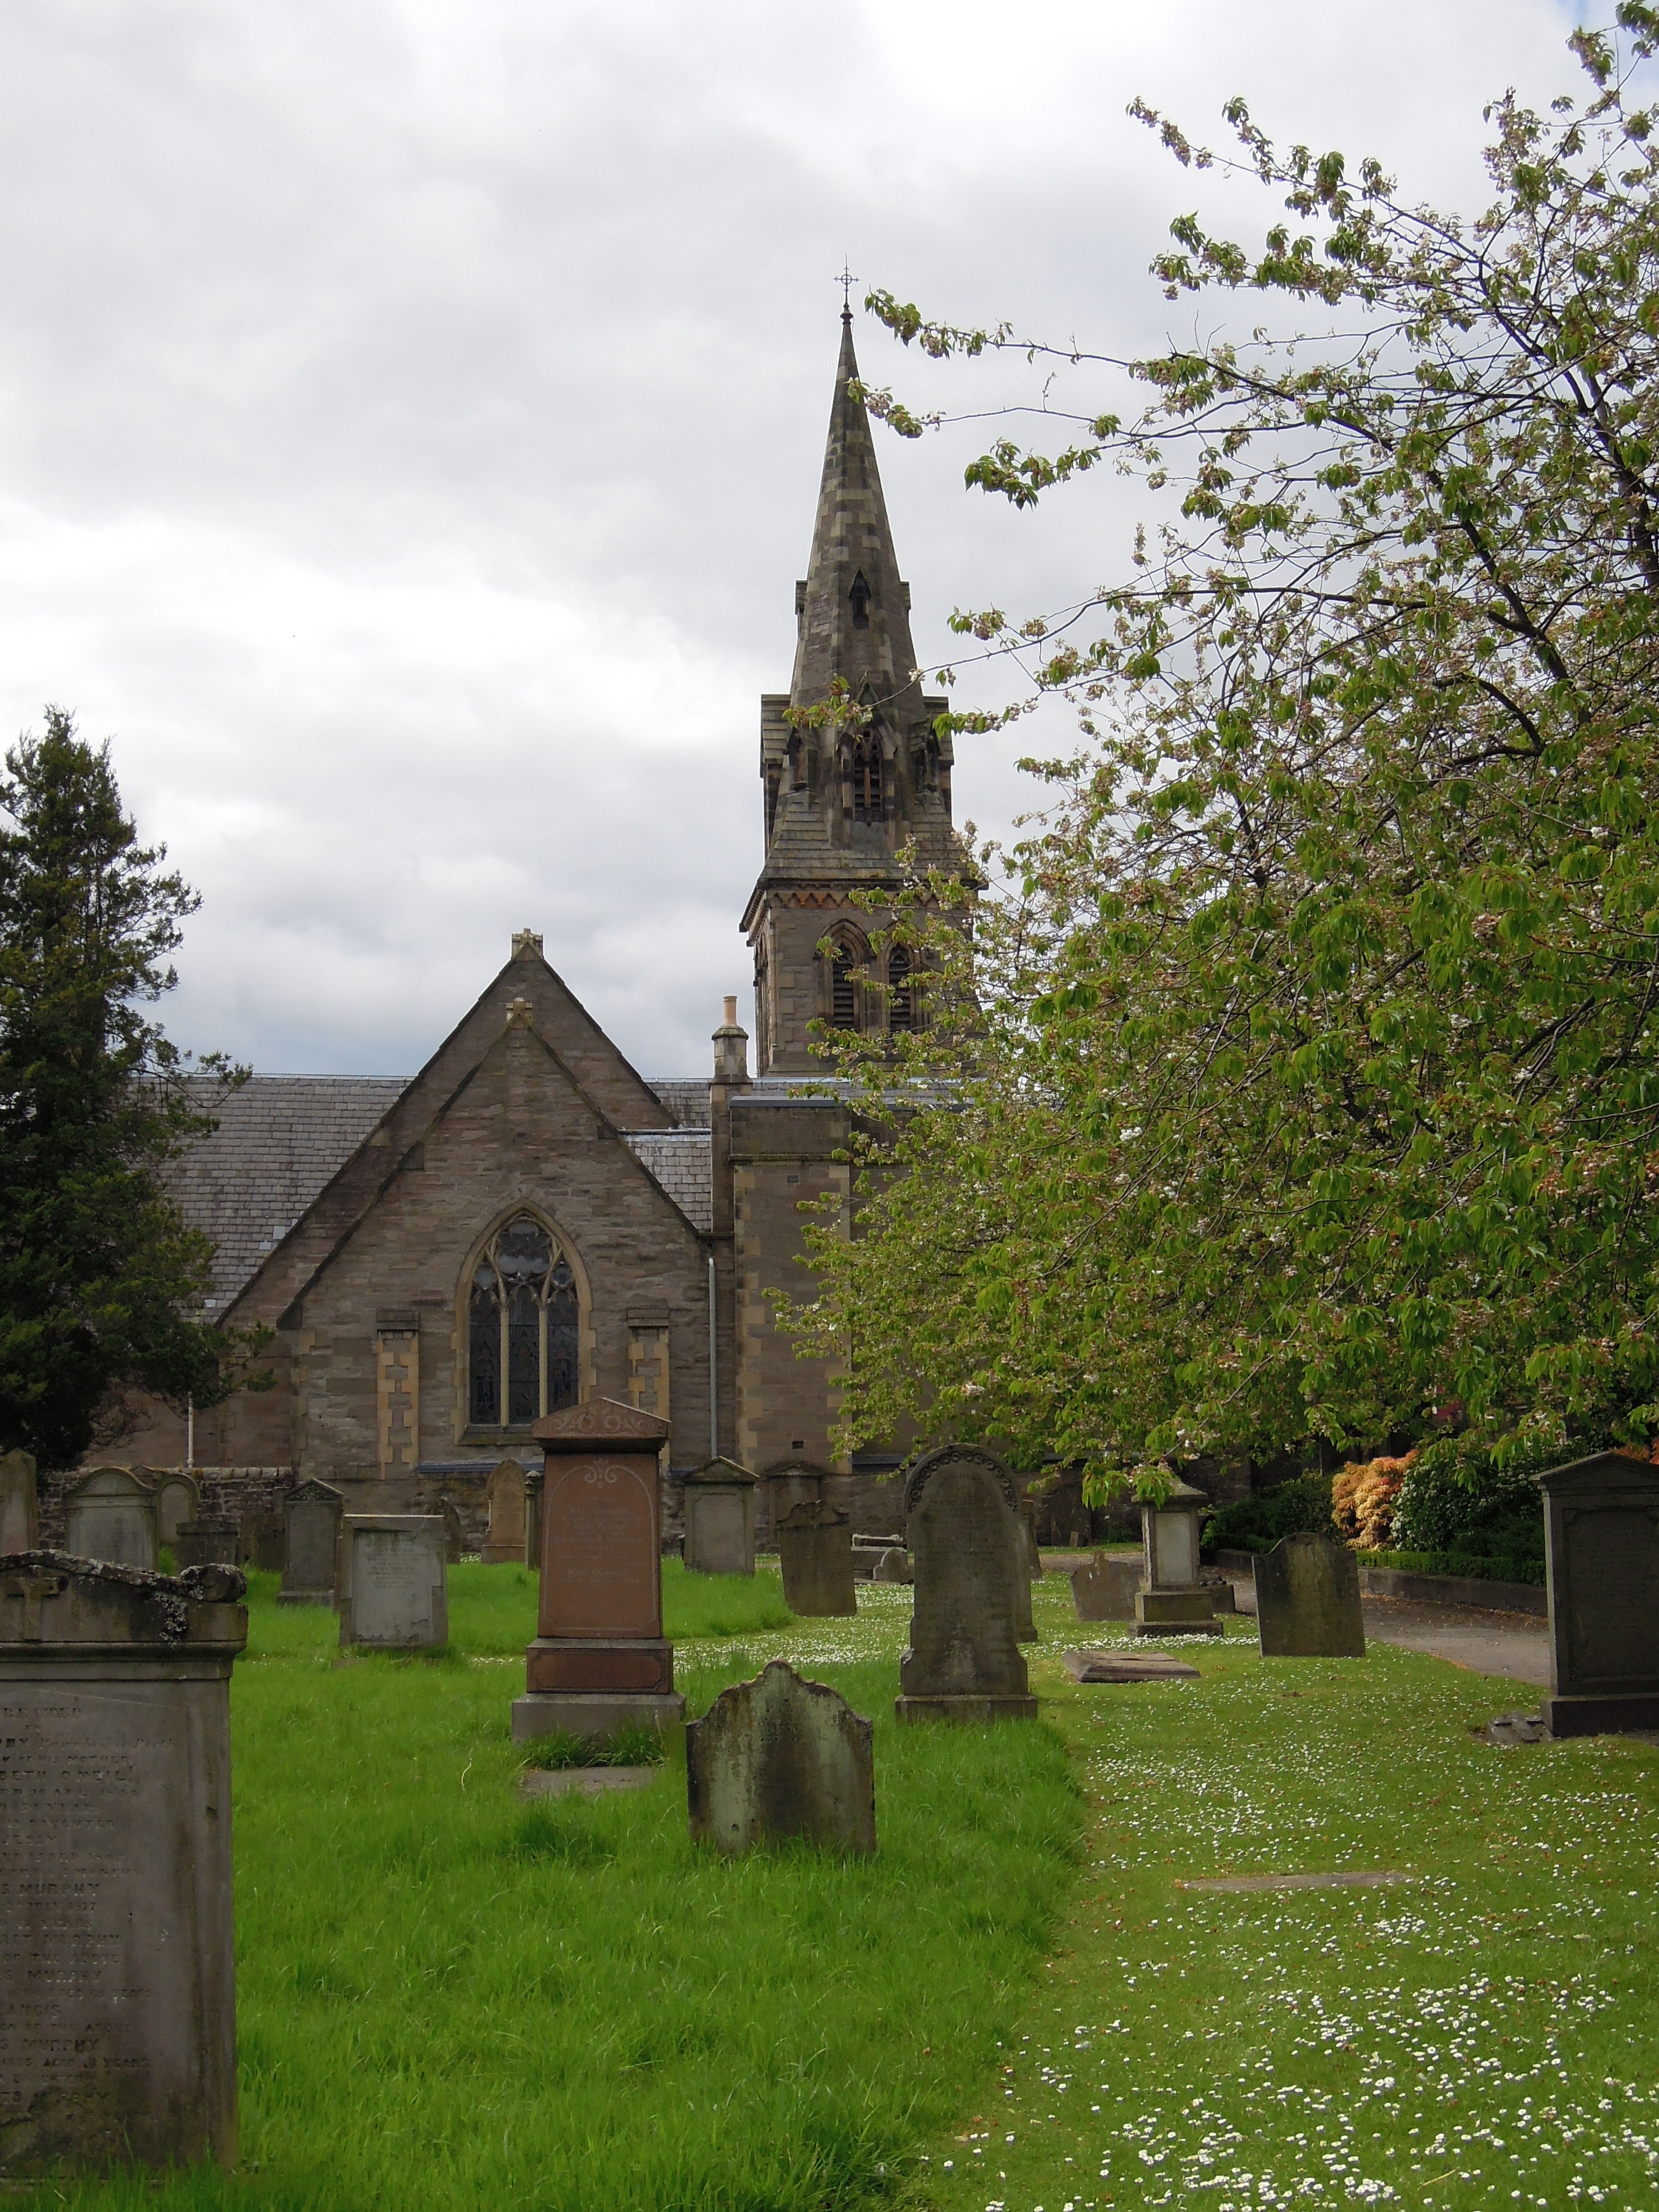 Greyfriars Burial Ground, copyright Allan Bradley